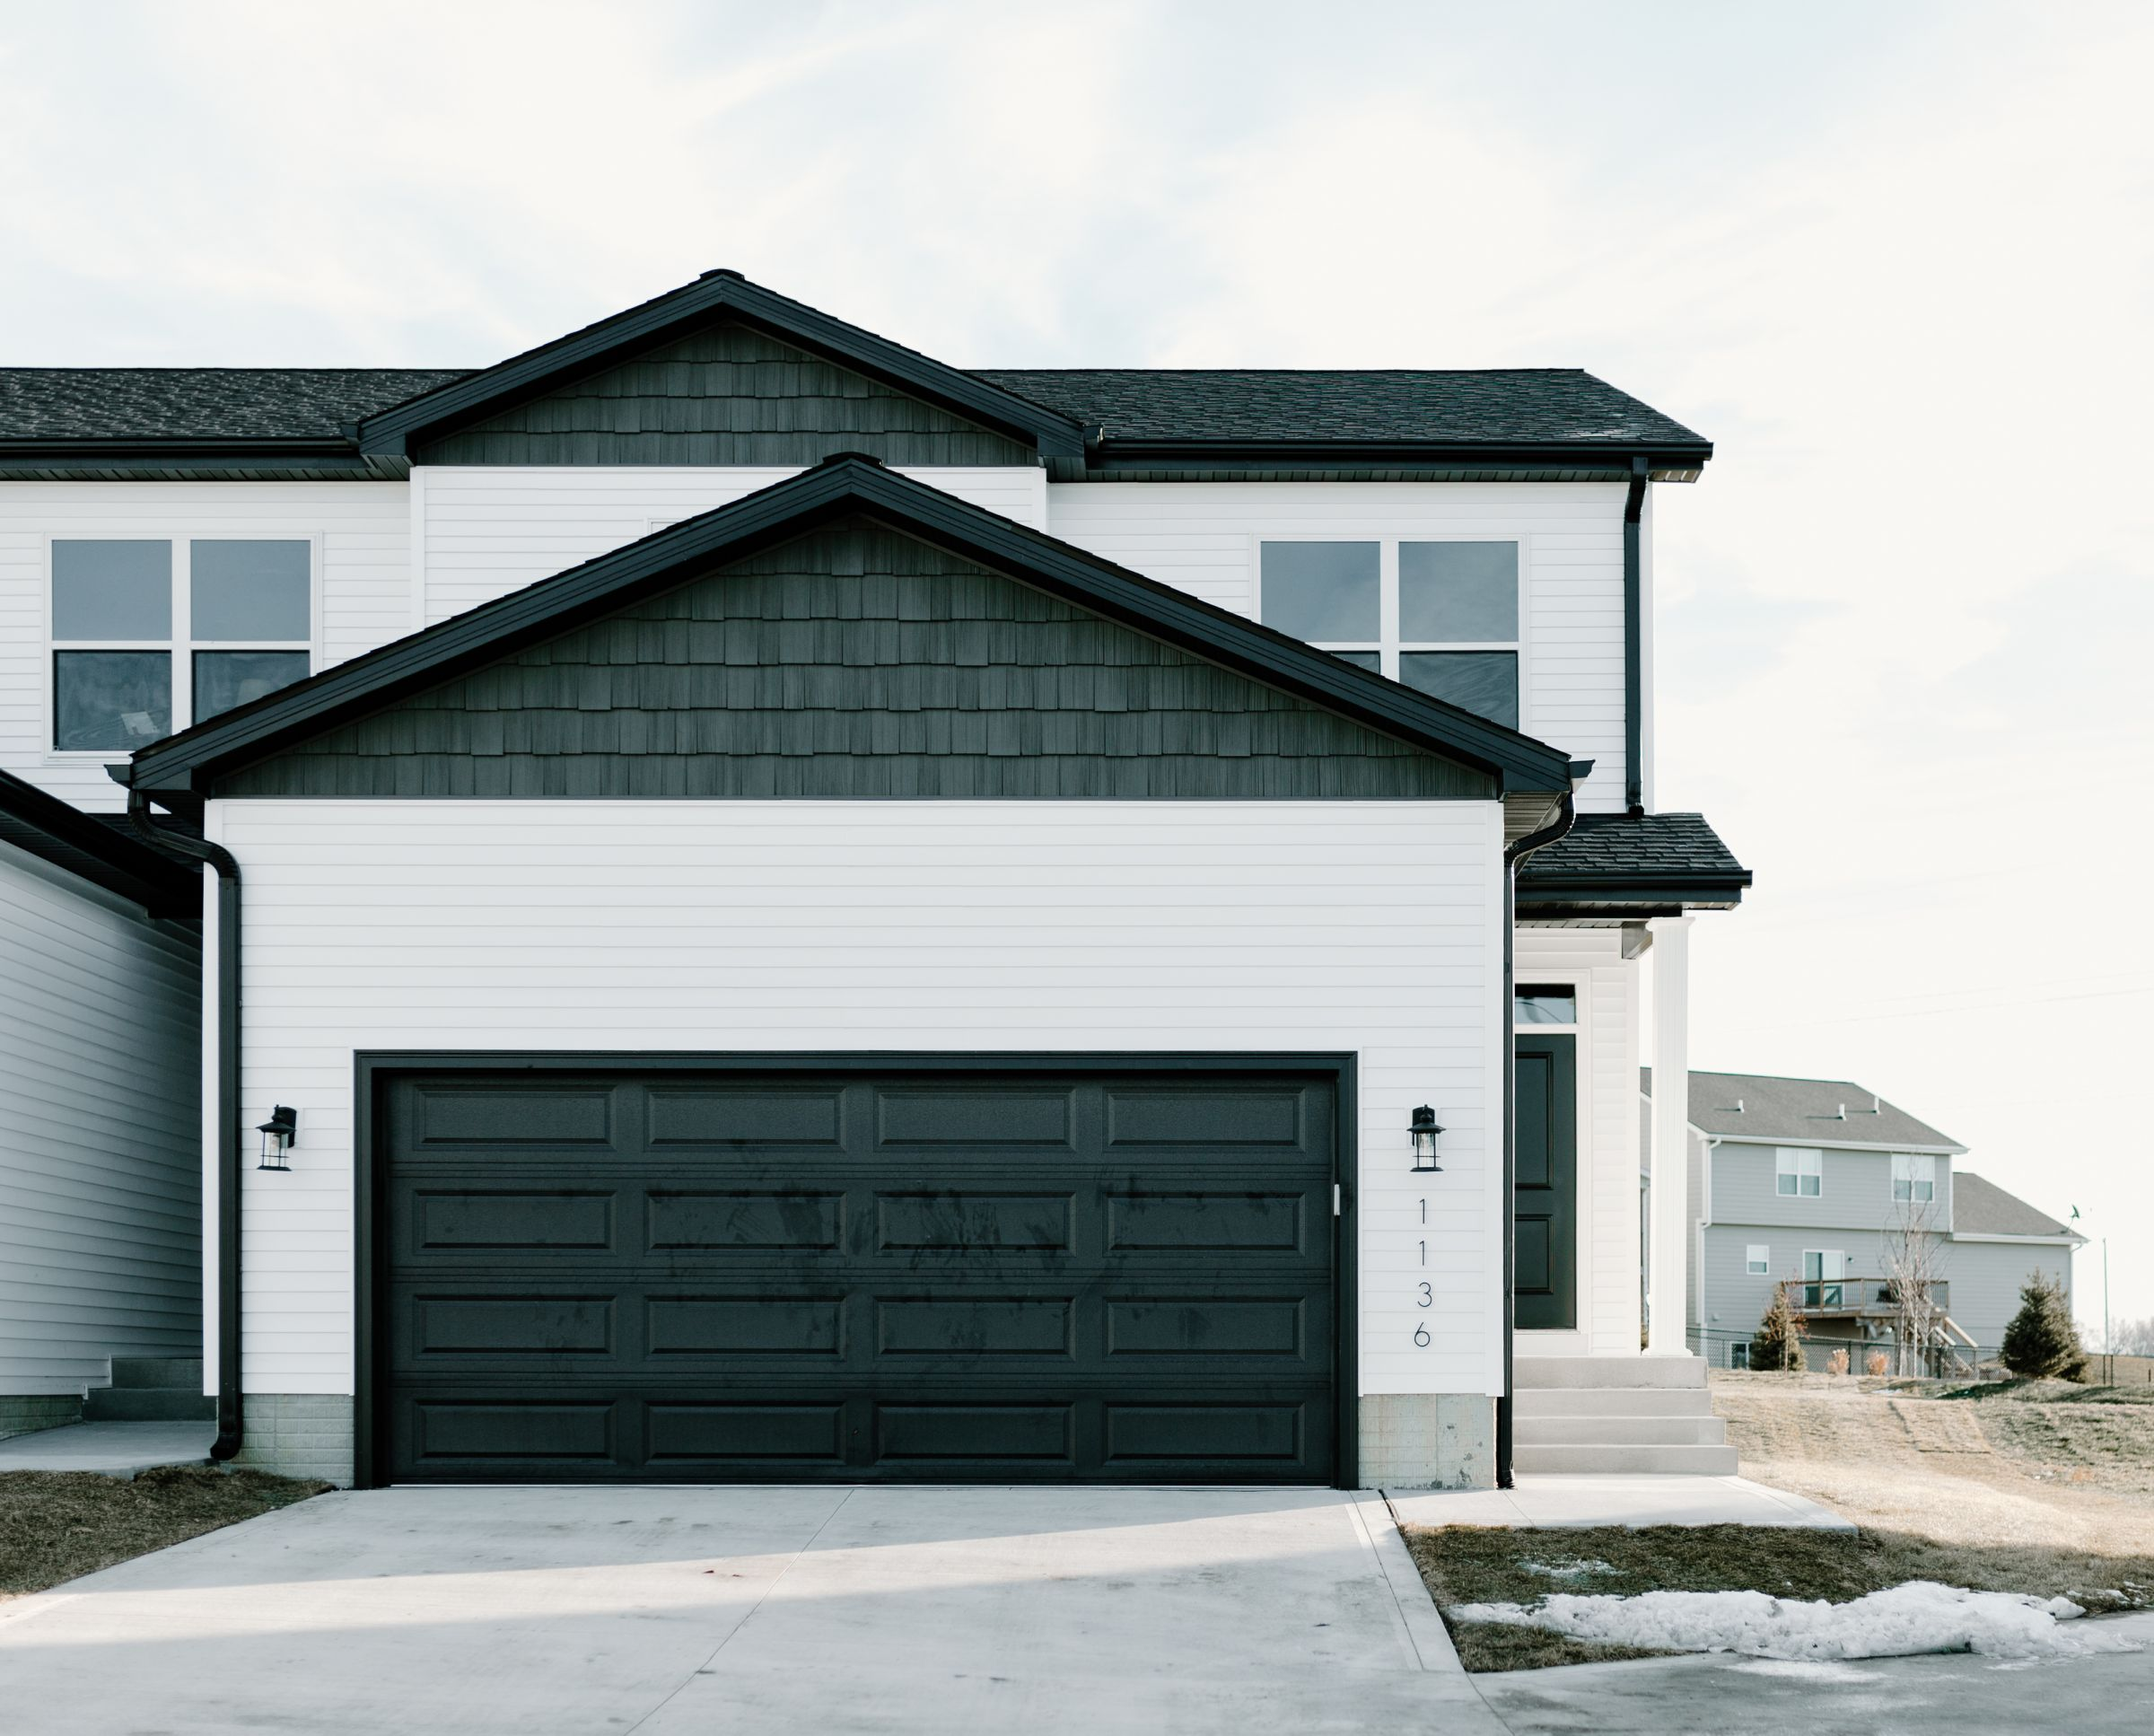 residential-warren-county-iowa-0-acres-listing-number-15138-6-2020-12-28-170250.jpg